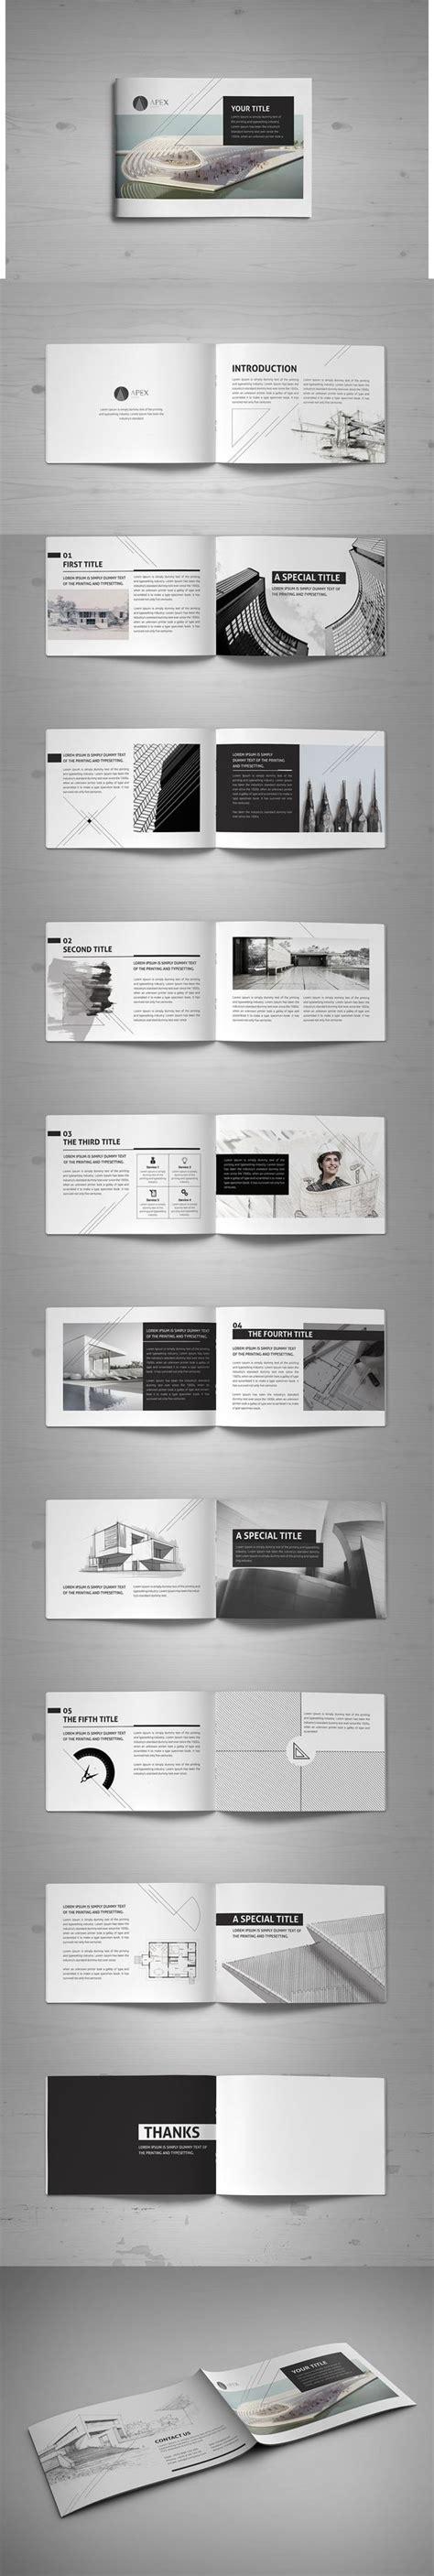 modern minimal business card indesign template minimal modern black white architecture brochure